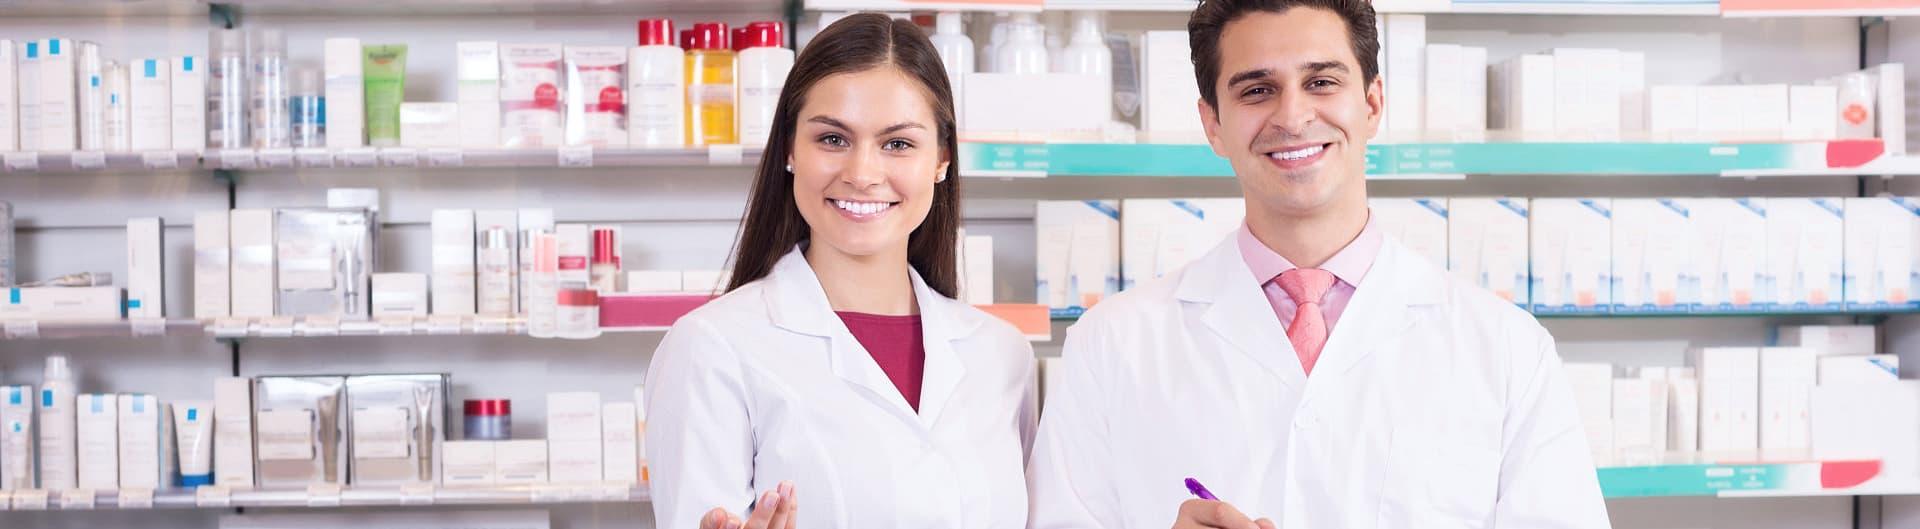 smiling pharmacists